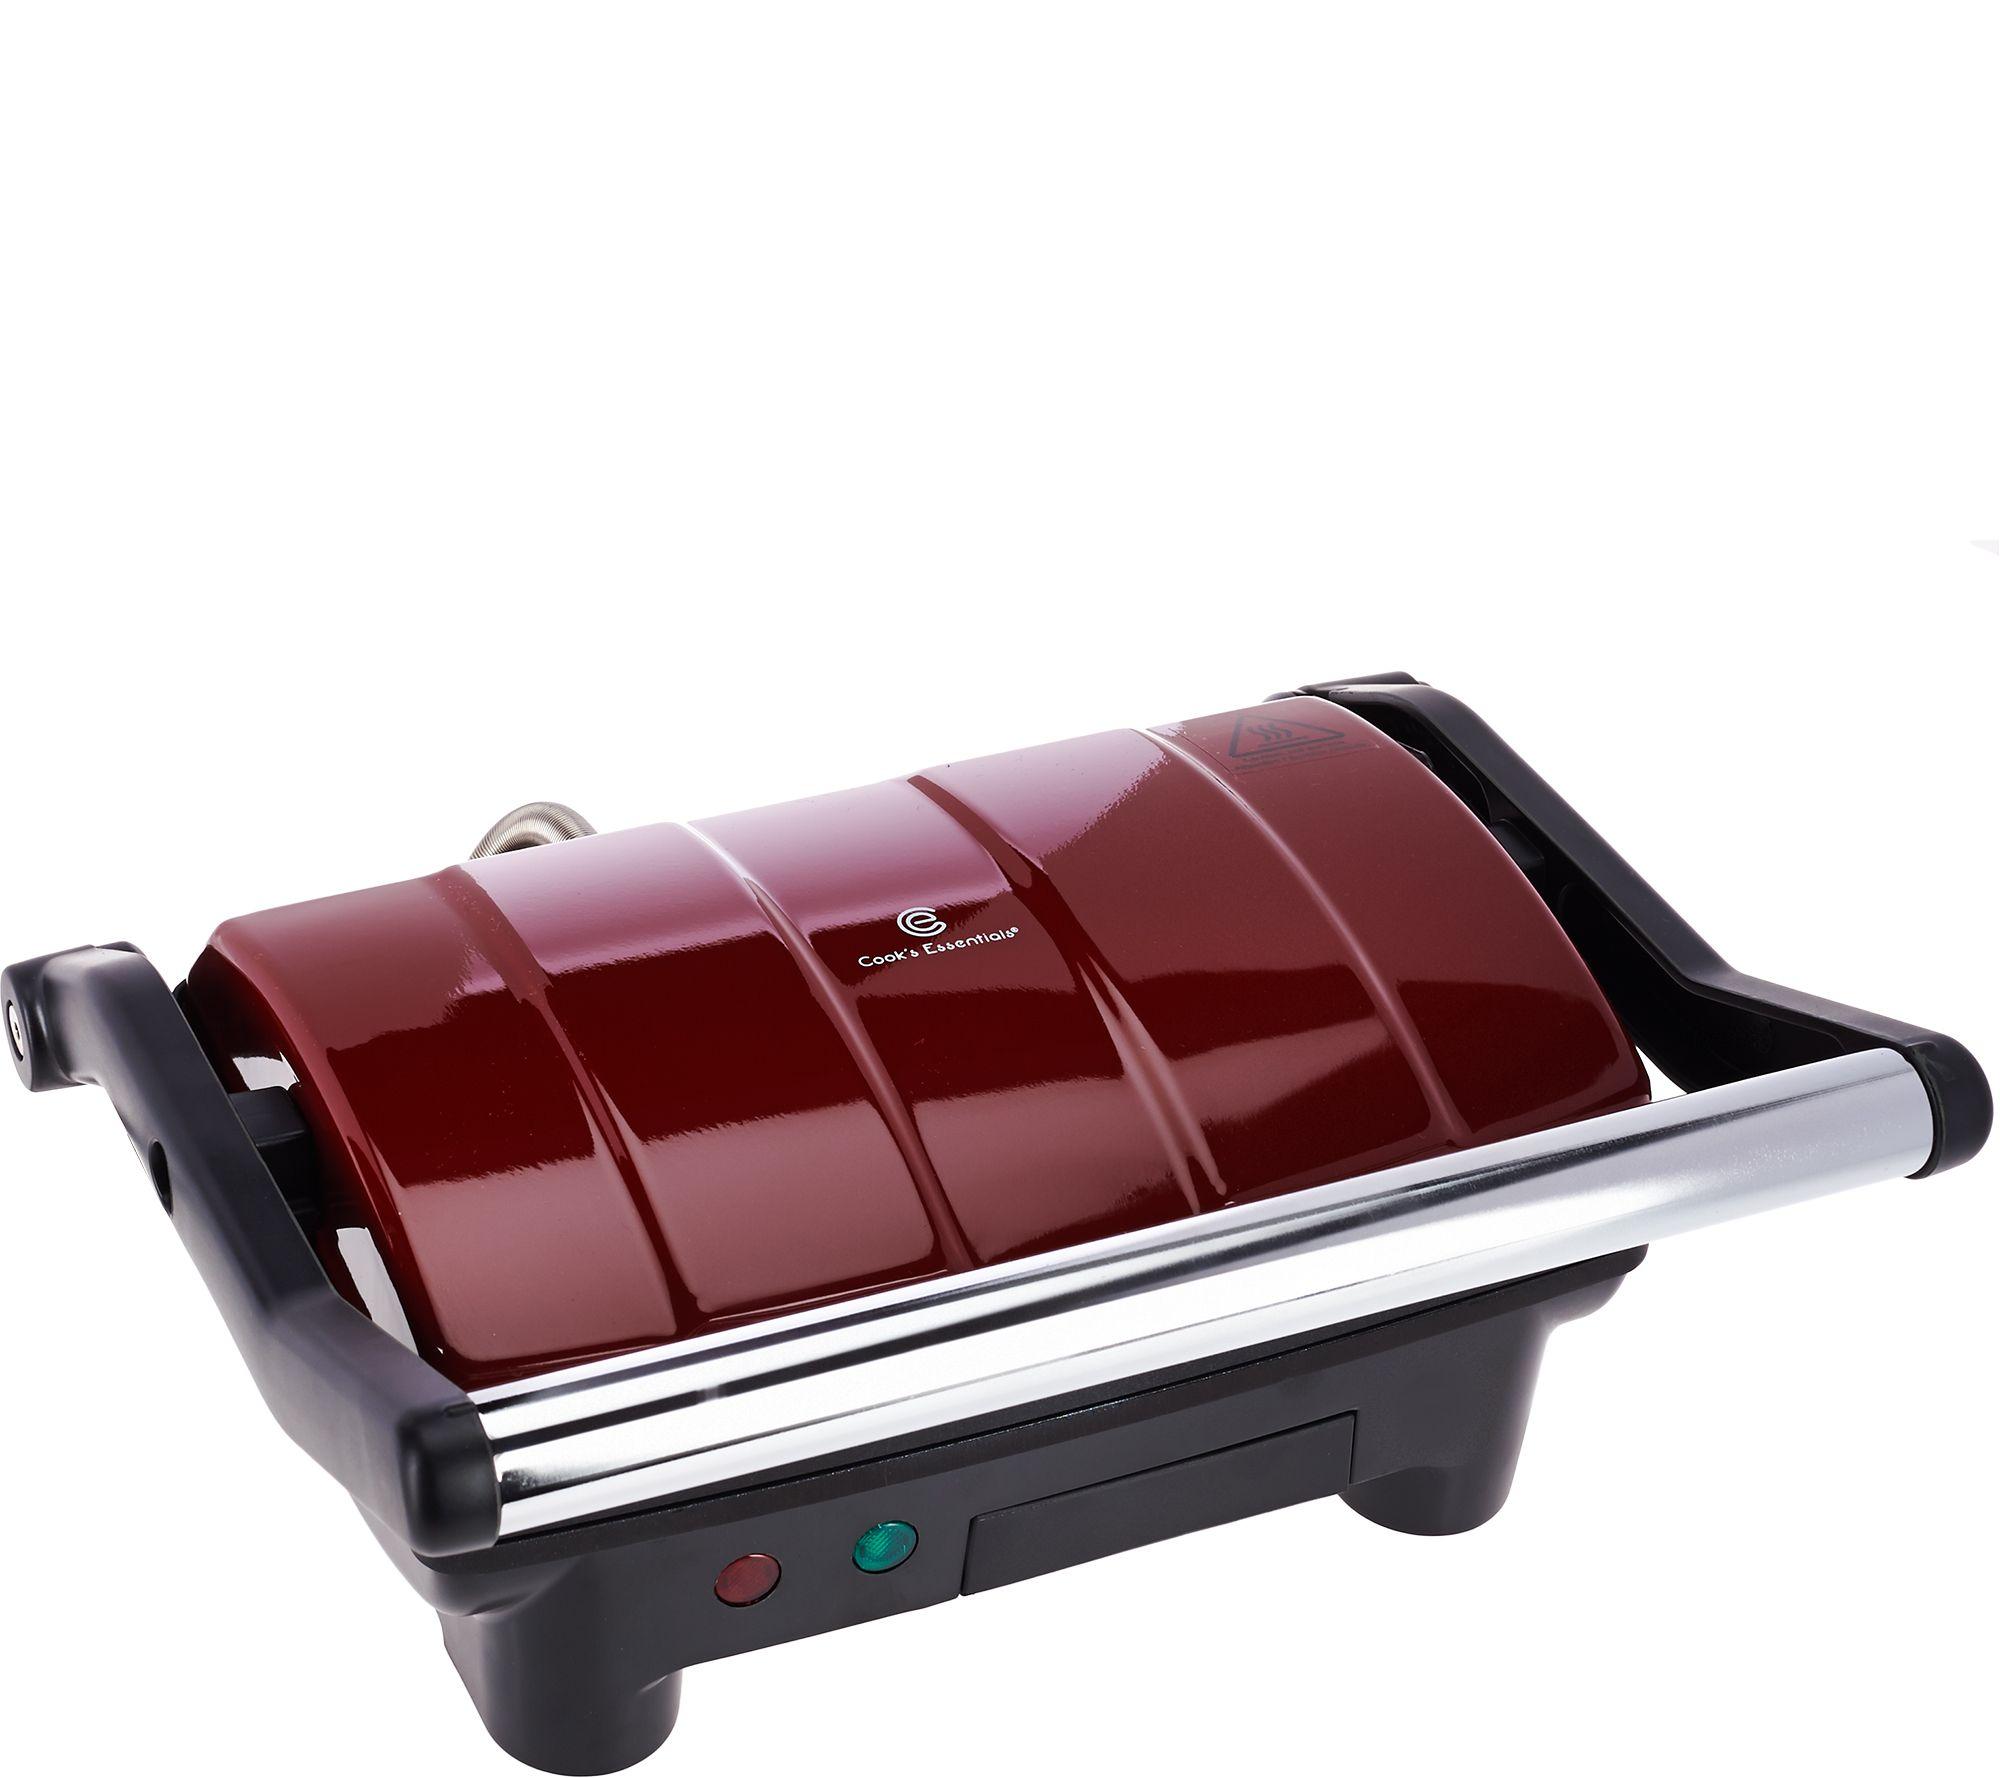 Cooks Brand Kitchen Appliances Cooks Essentials Grills Smokers Kitchen Food Qvccom